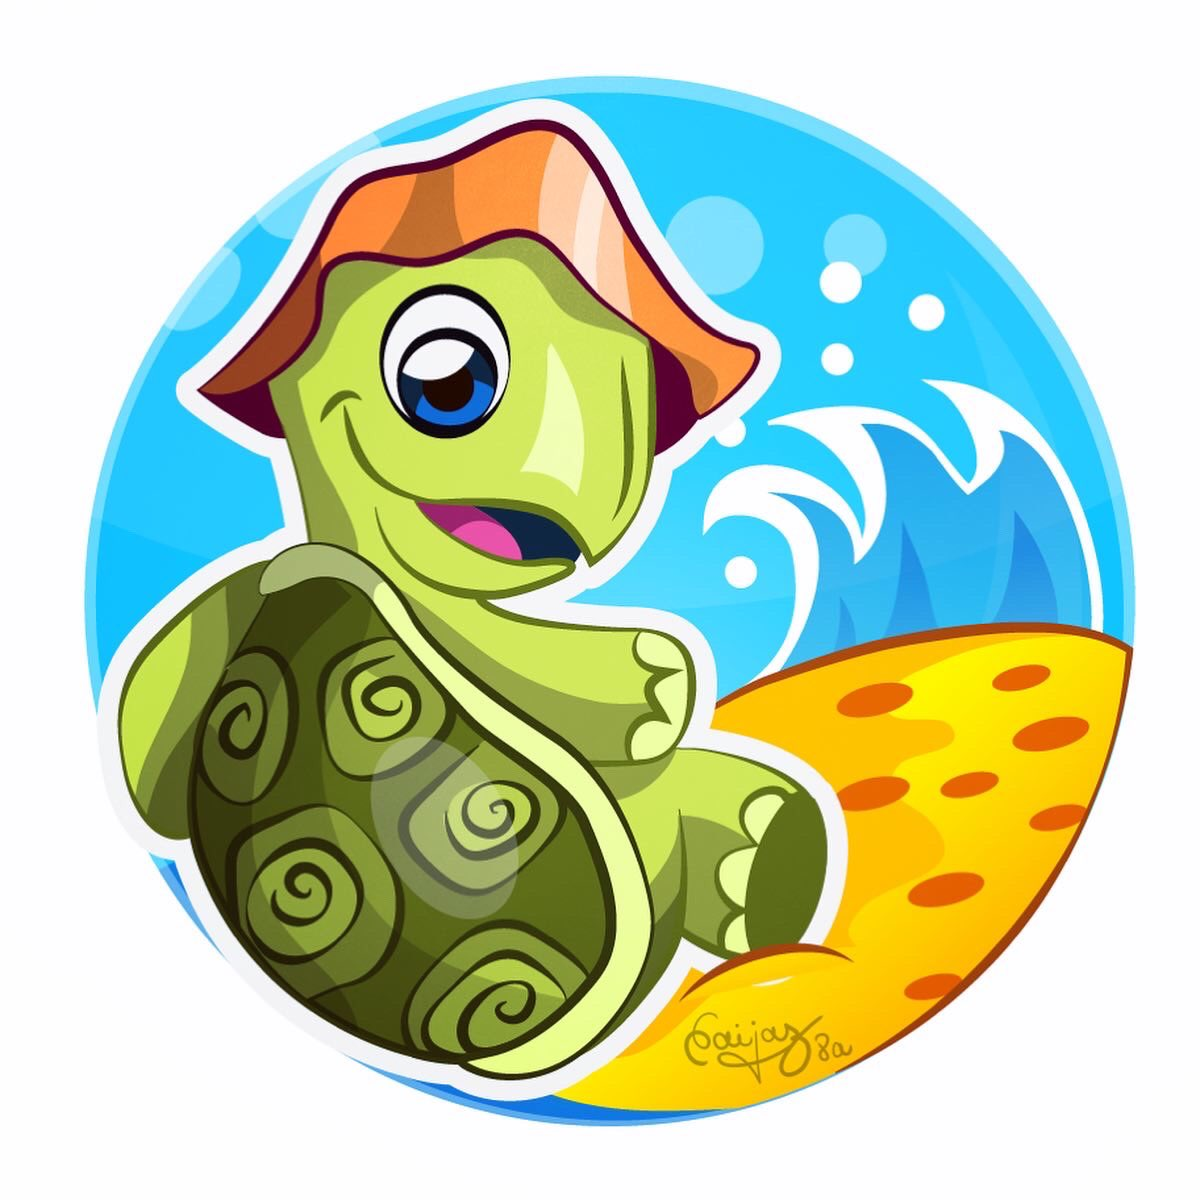 Turtle Summer  . #illustration #illustrator #illustrationagency #stickers #stickerart #sticker #characterdesign #characterillustration #childrensbooks #childrensbookillustration #childrensillustration #cute #cuteanimals #turtle #tortoise #tortuga #cuteillustrationpic.twitter.com/vrc93bO56G